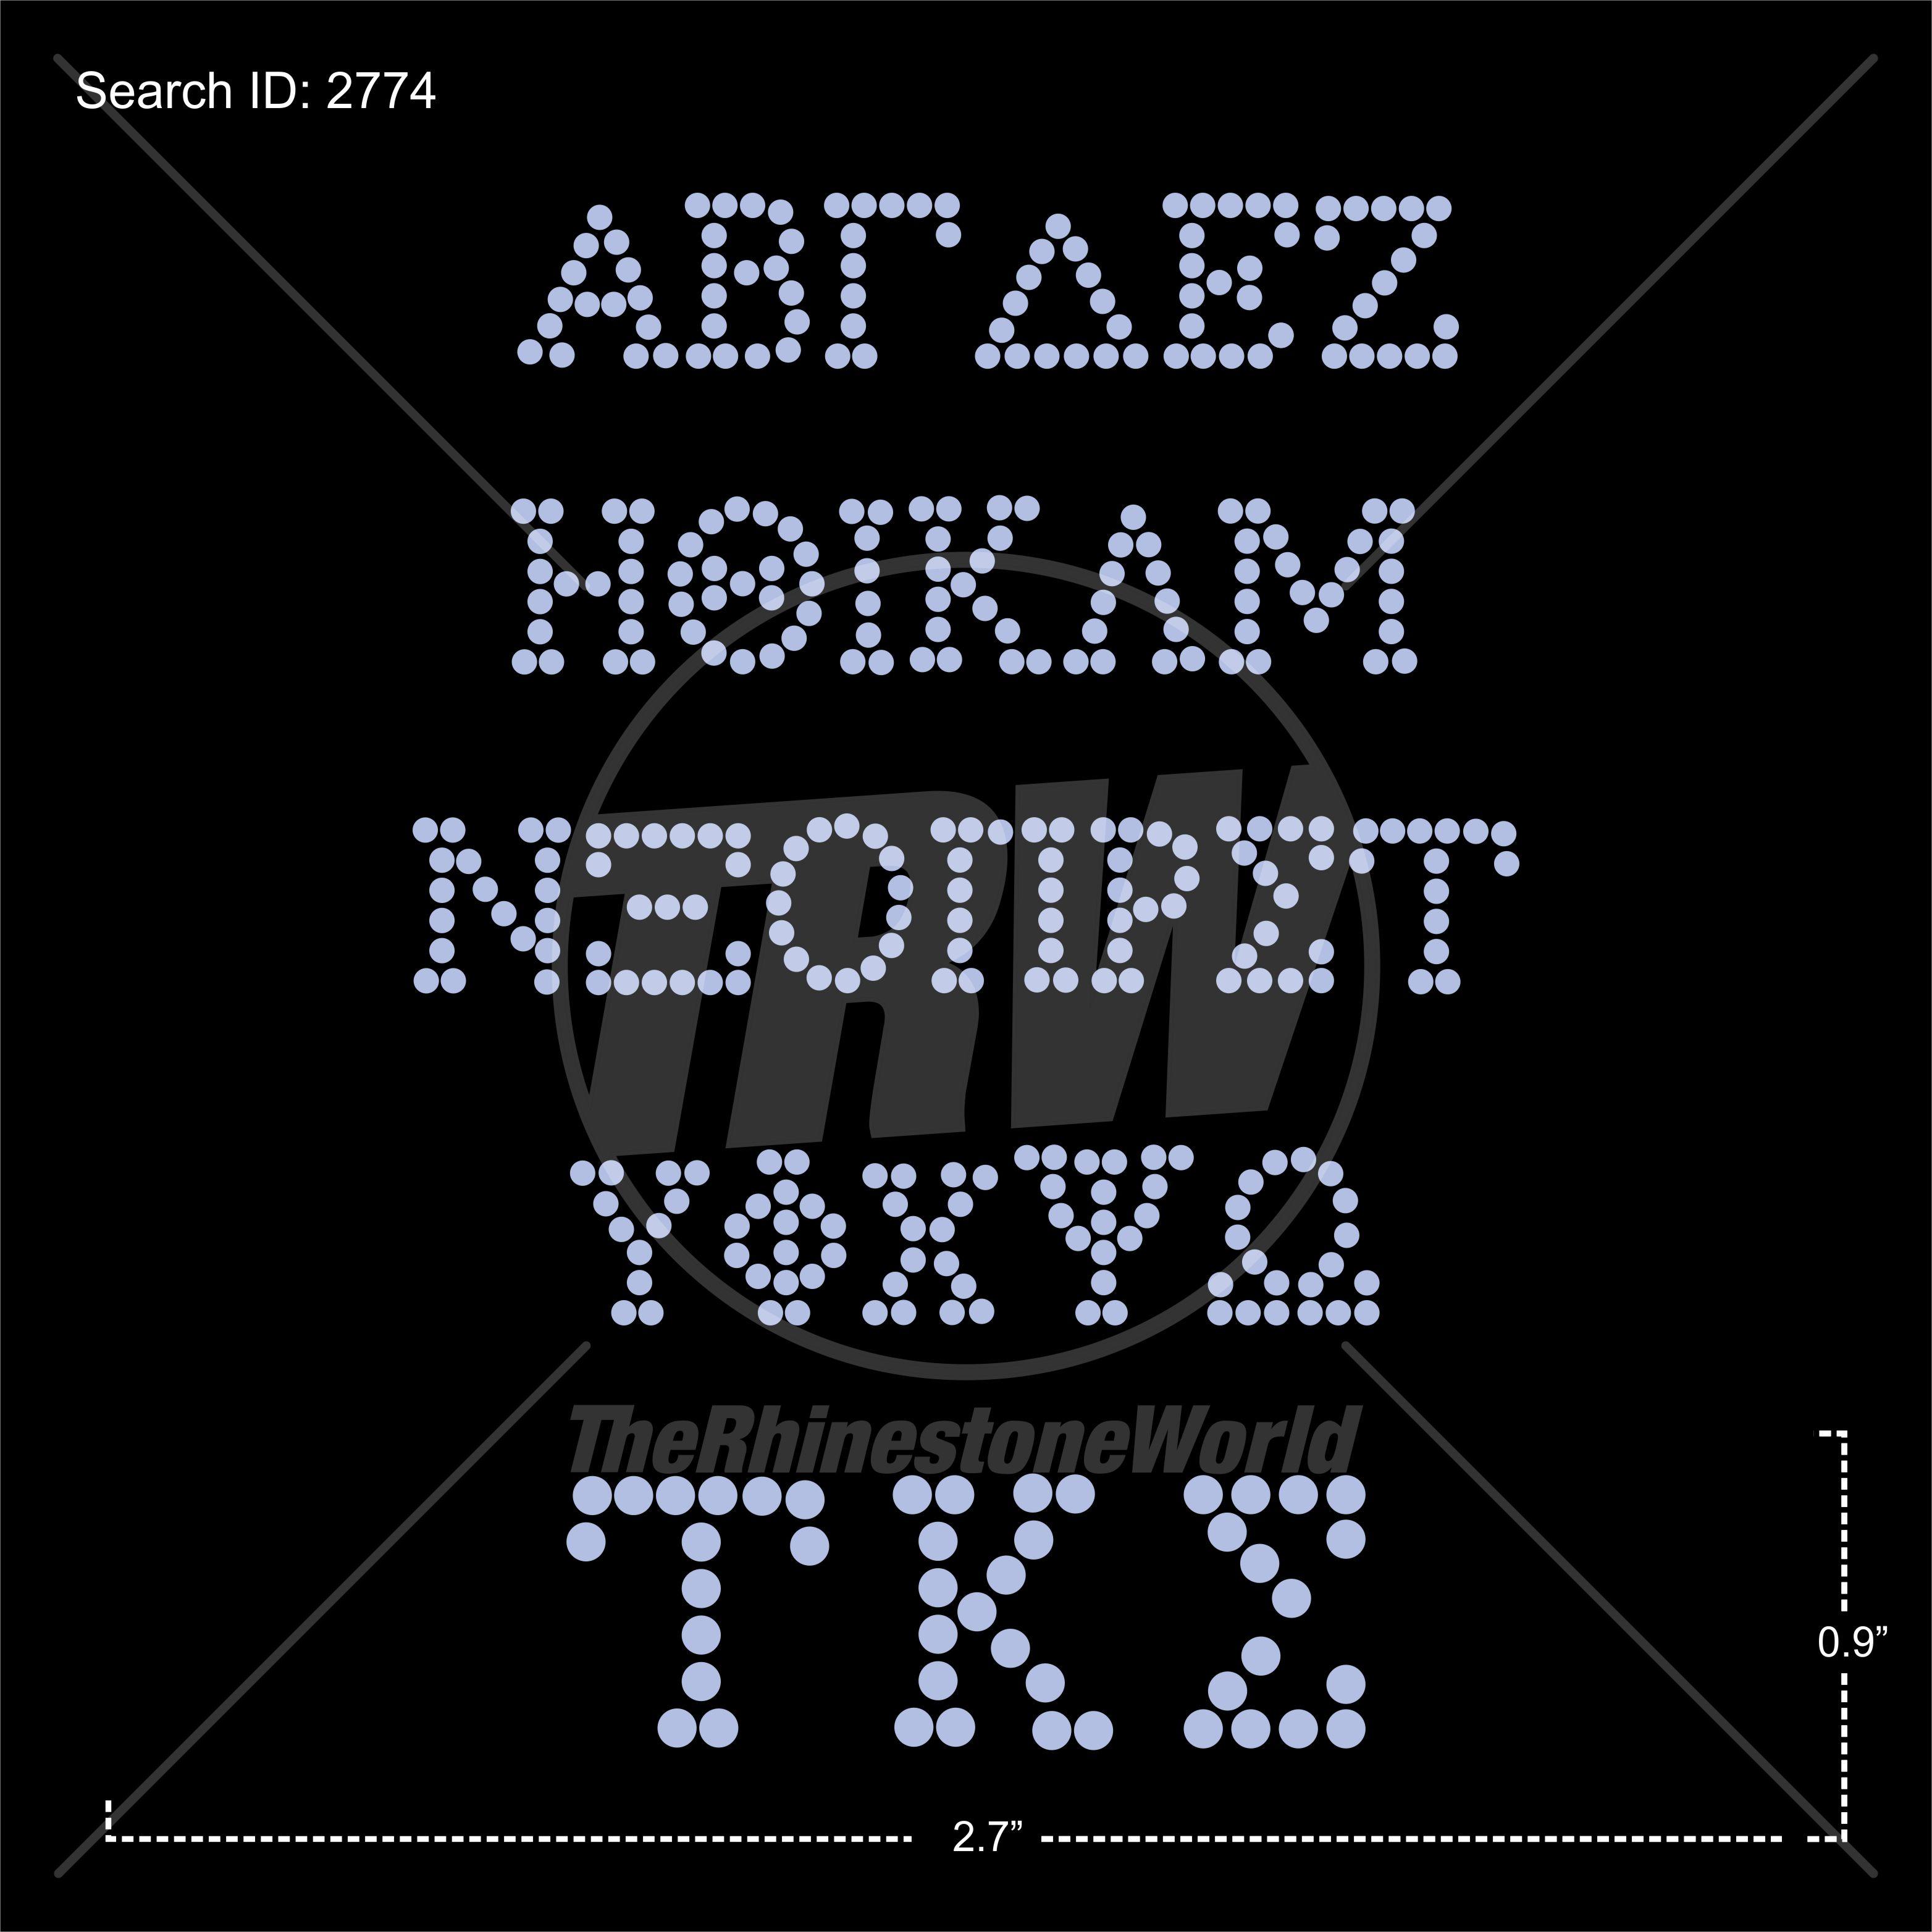 Trw 70 1 Greek Alphabet 1 Color File Pre Cut Template